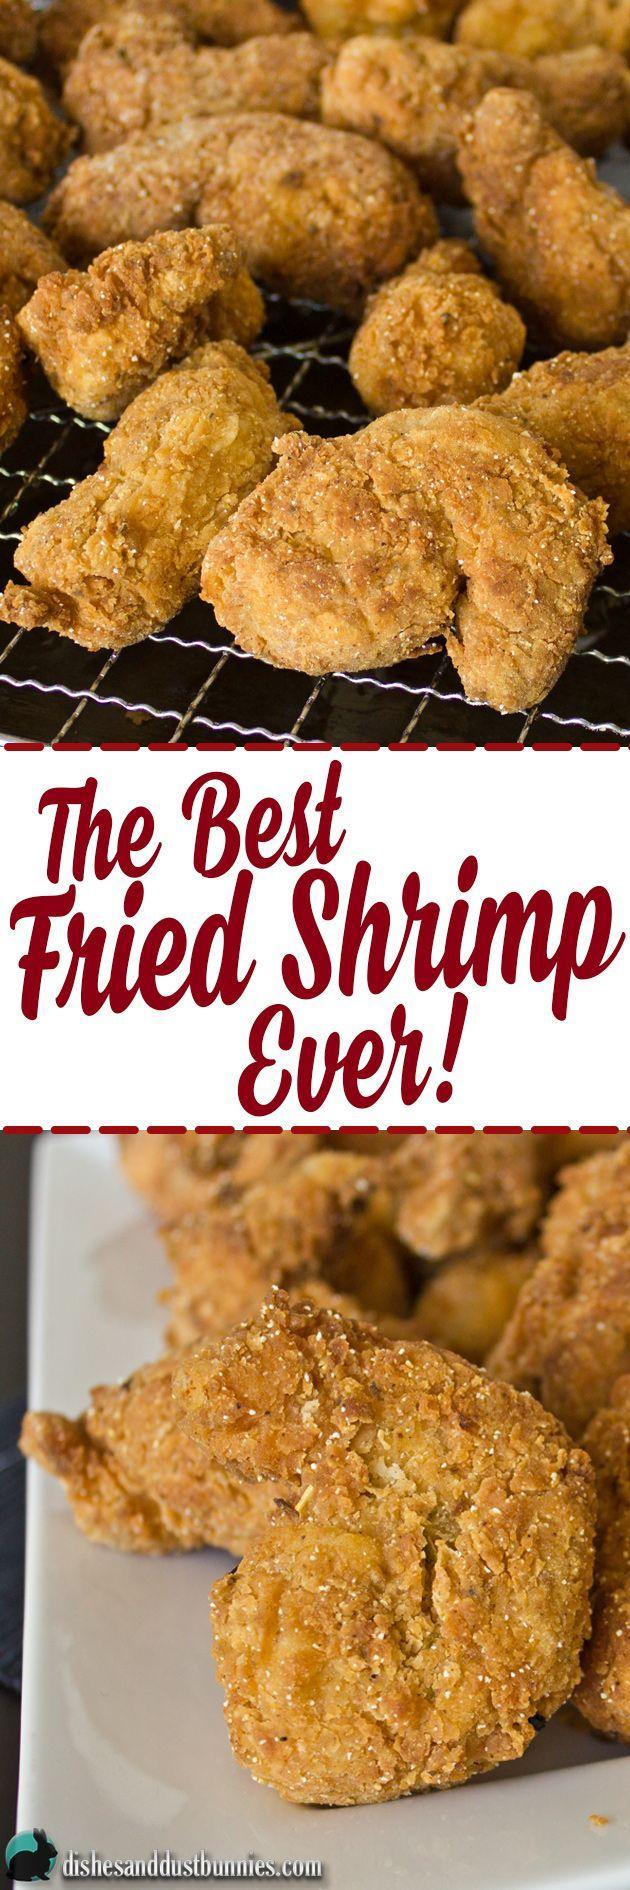 The Best Fried Shrimp EVER! via @mvdustbunnies